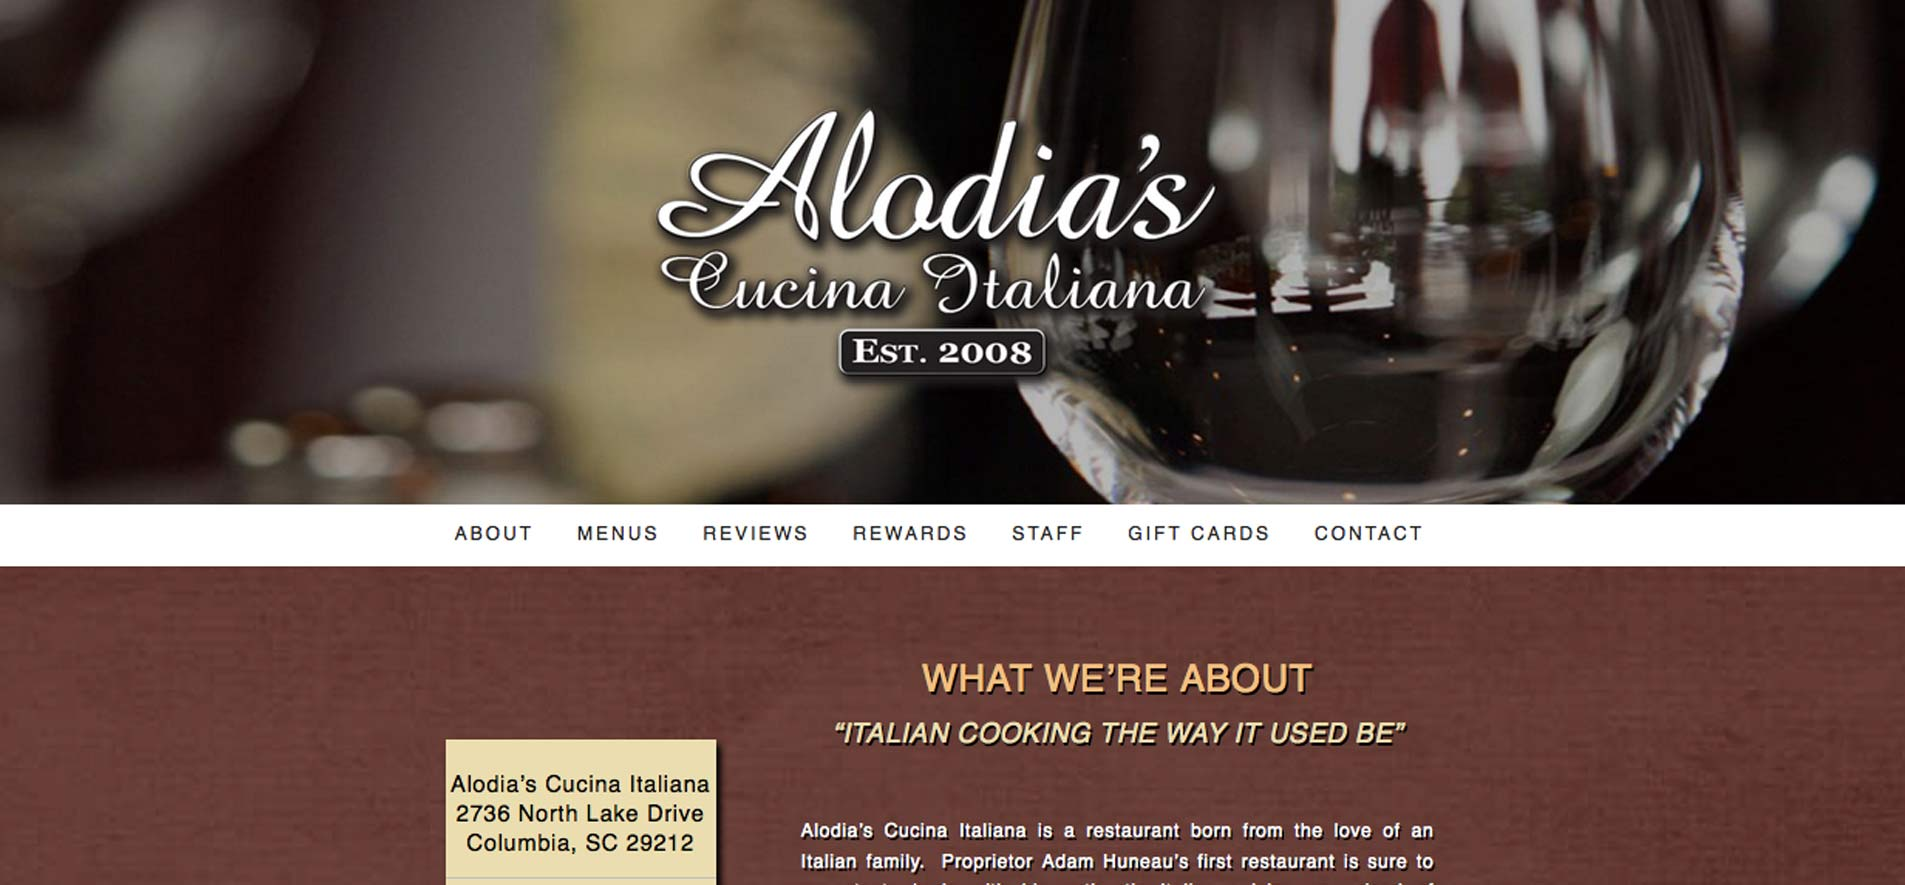 Alodias Cucina Italiana